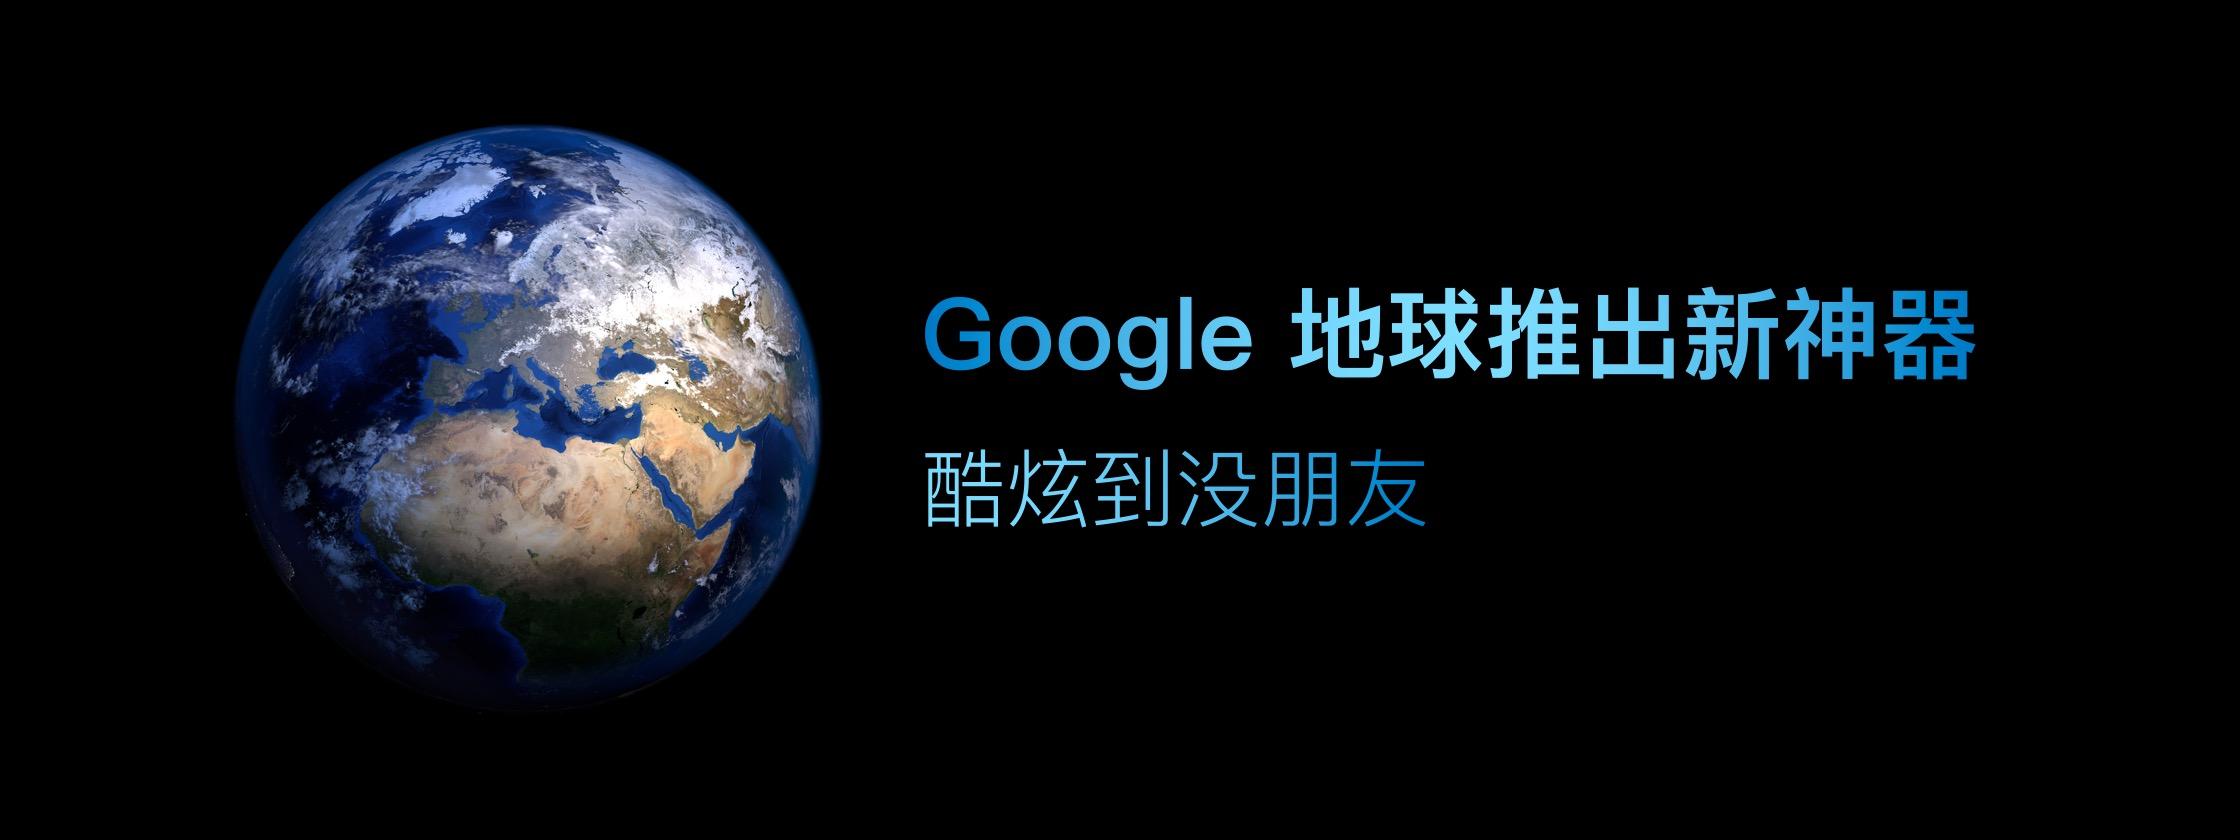 Google 地球推出新神器,酷炫到没朋友